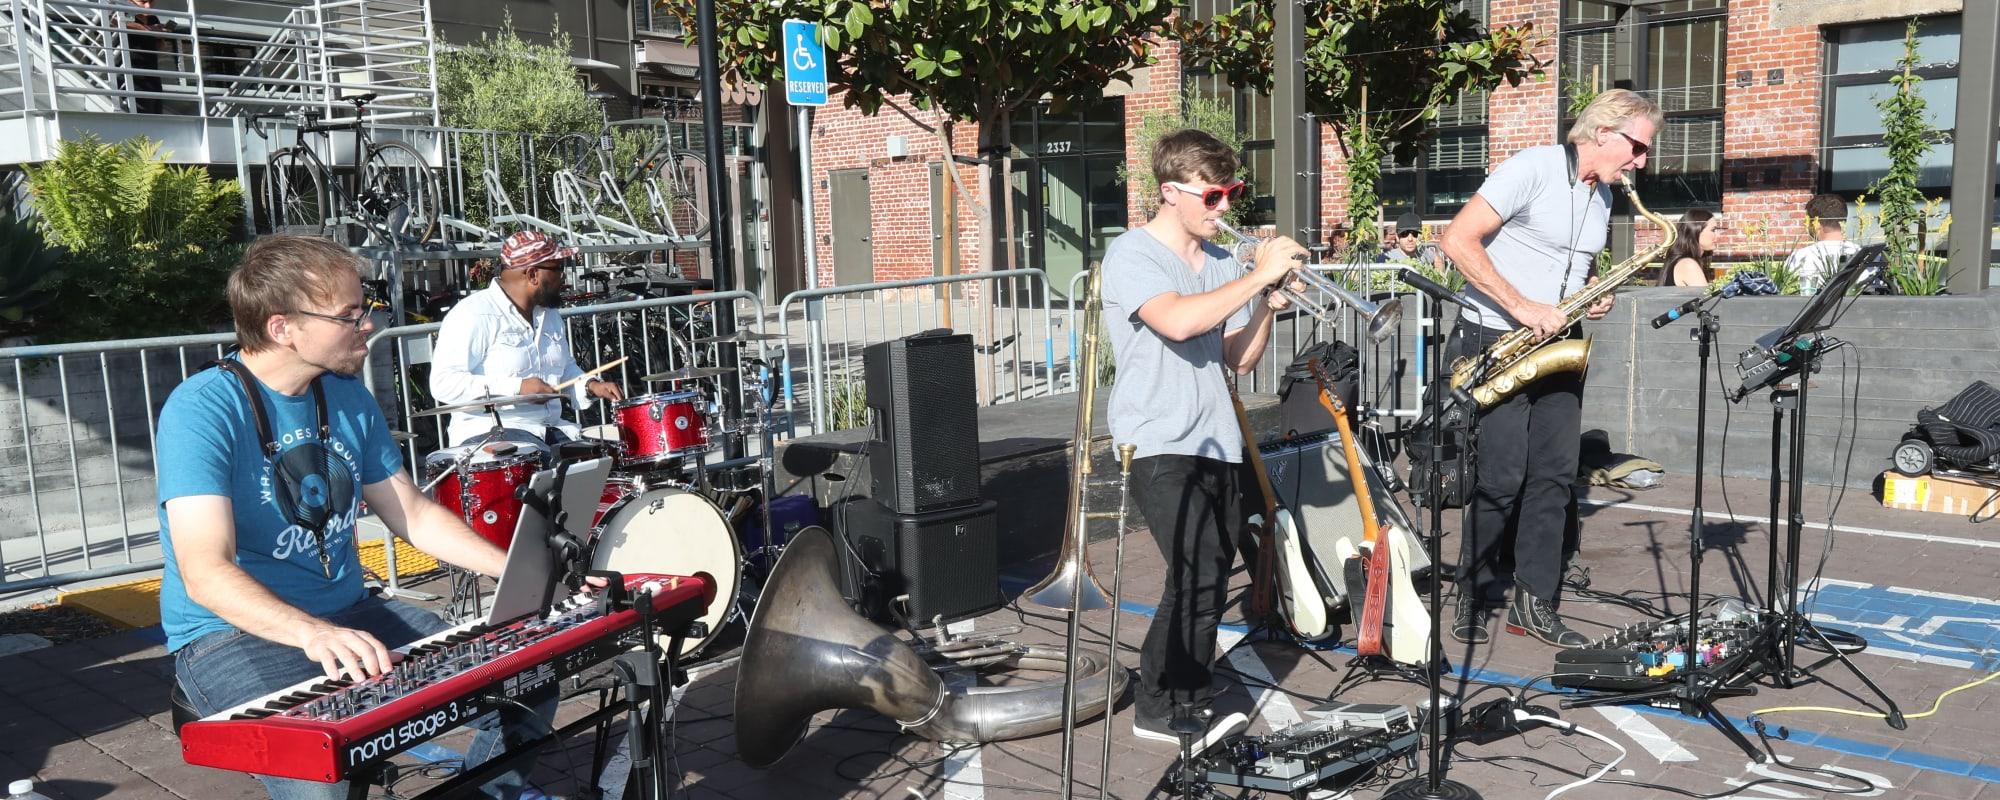 Friends playing music near The Moran in Oakland, California